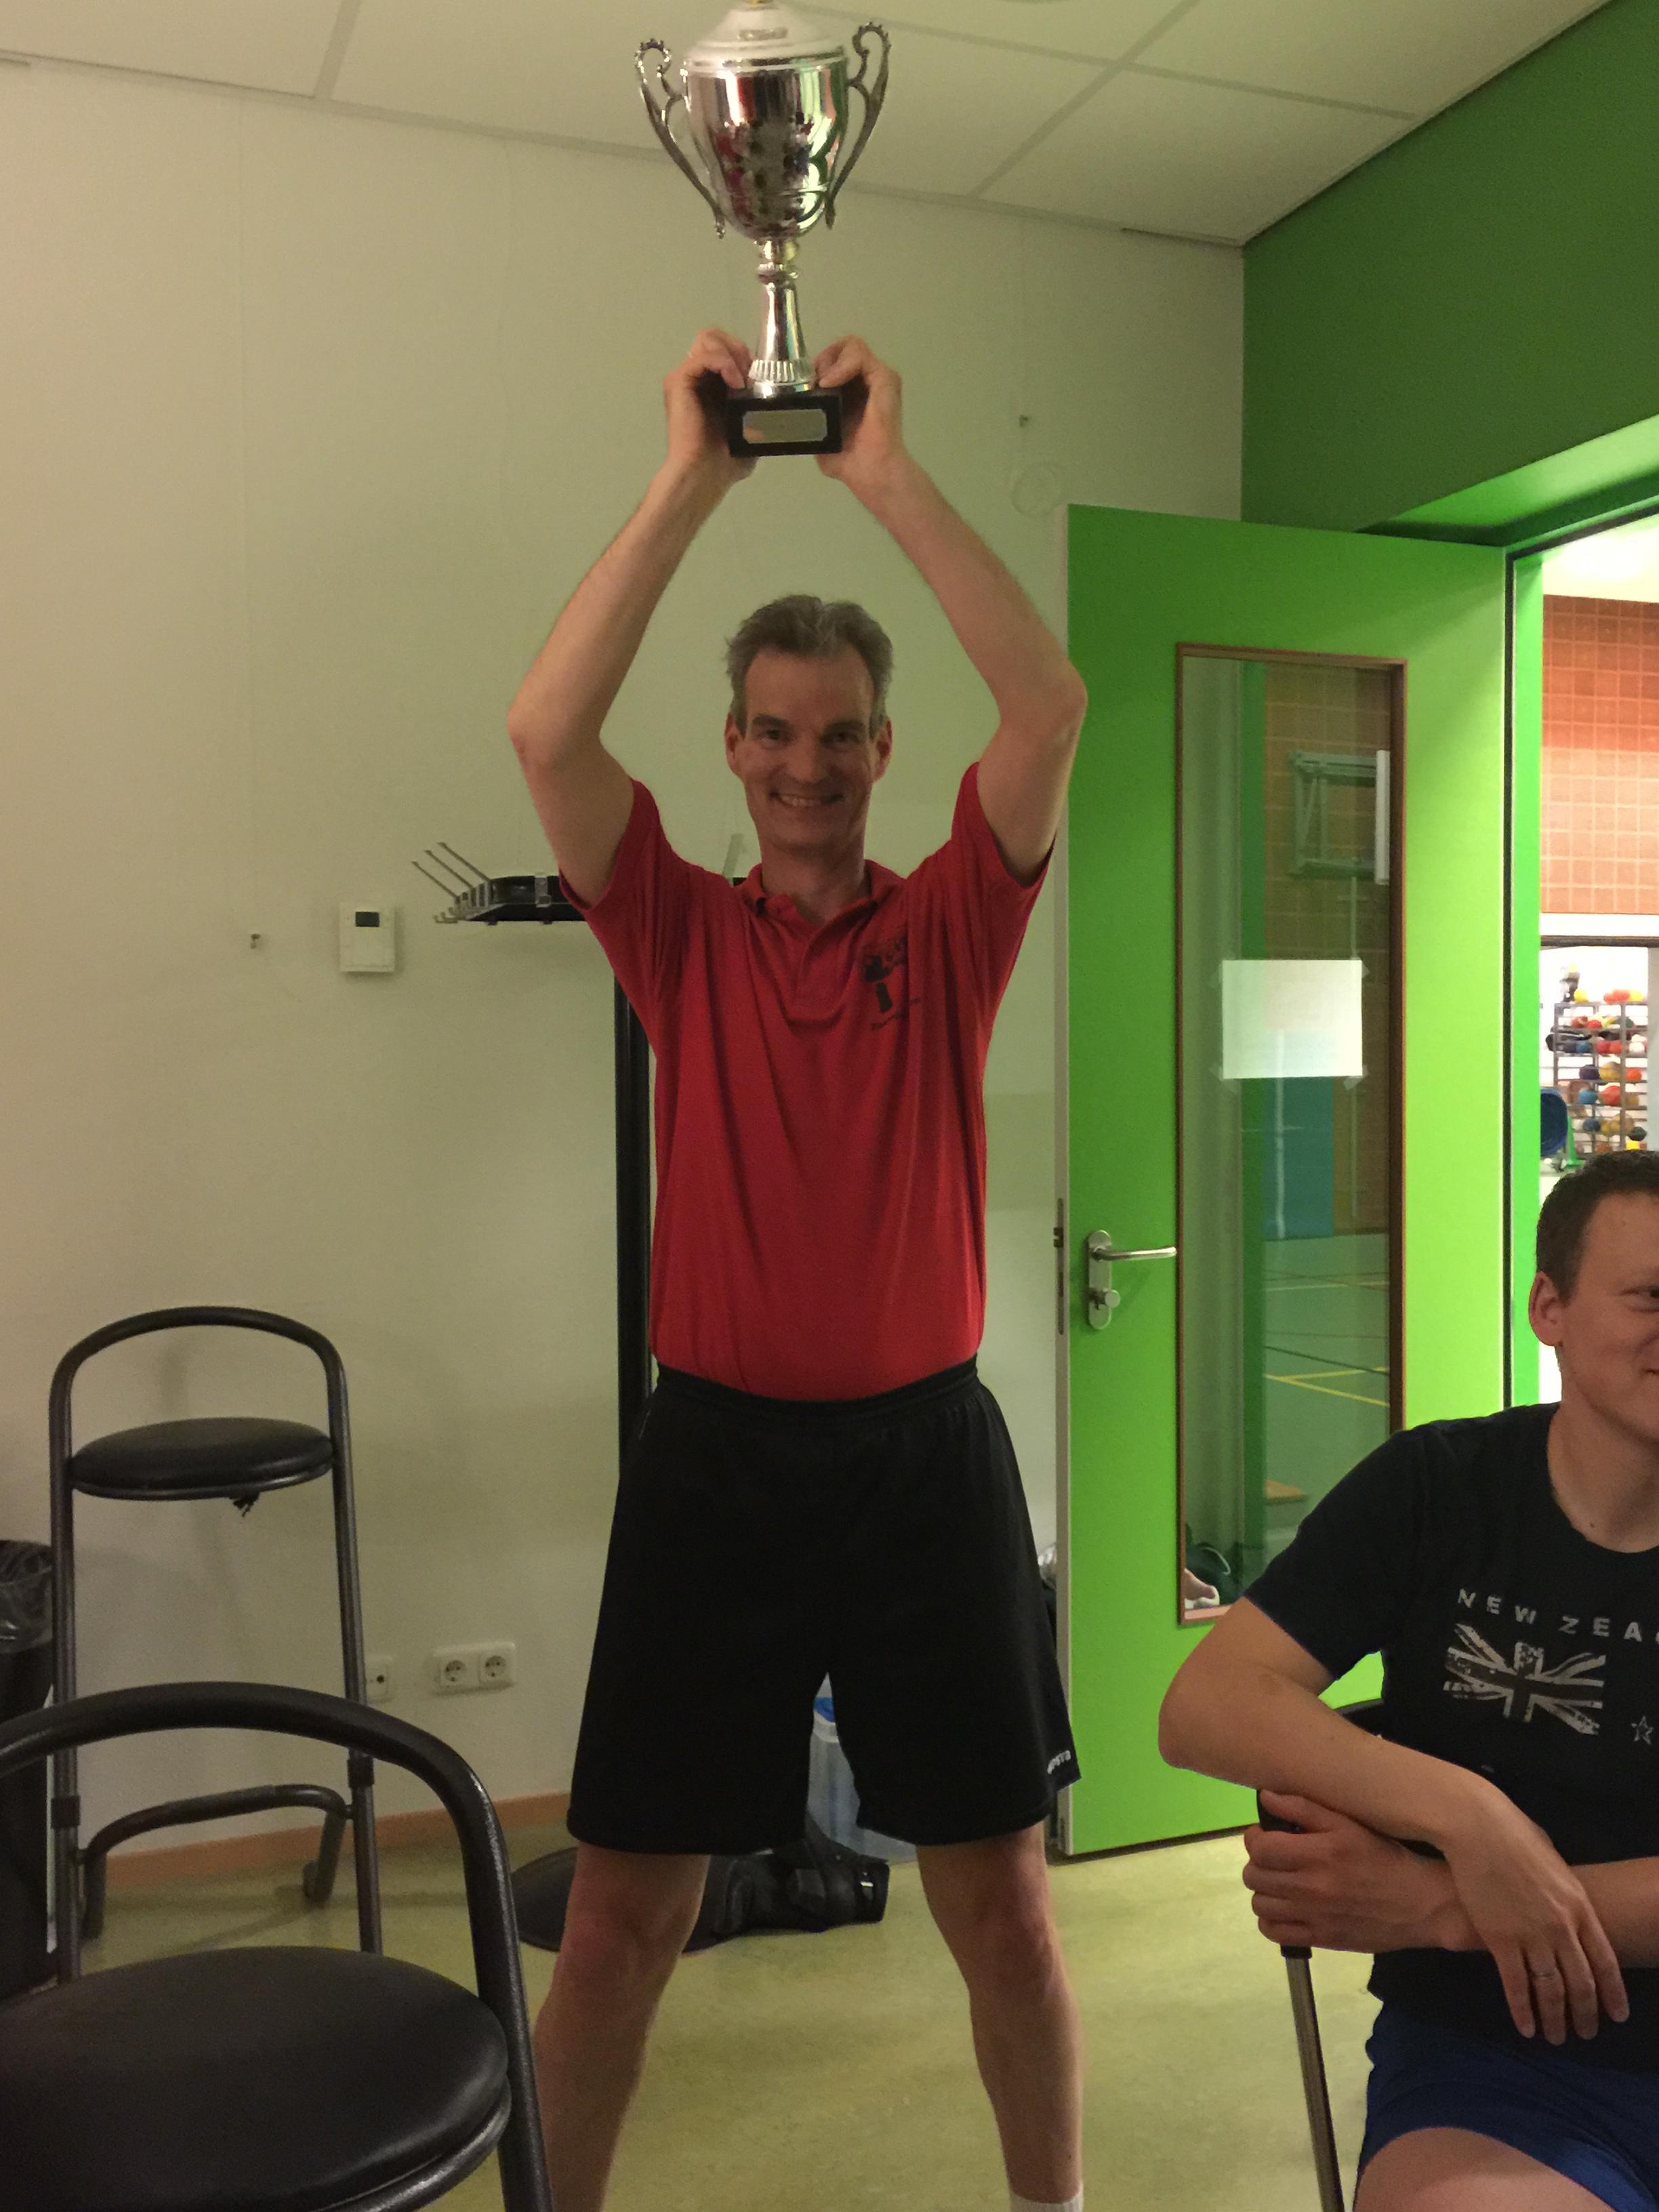 Clubkampioen Senioren 2014-2015: Gert-Jan Moerland